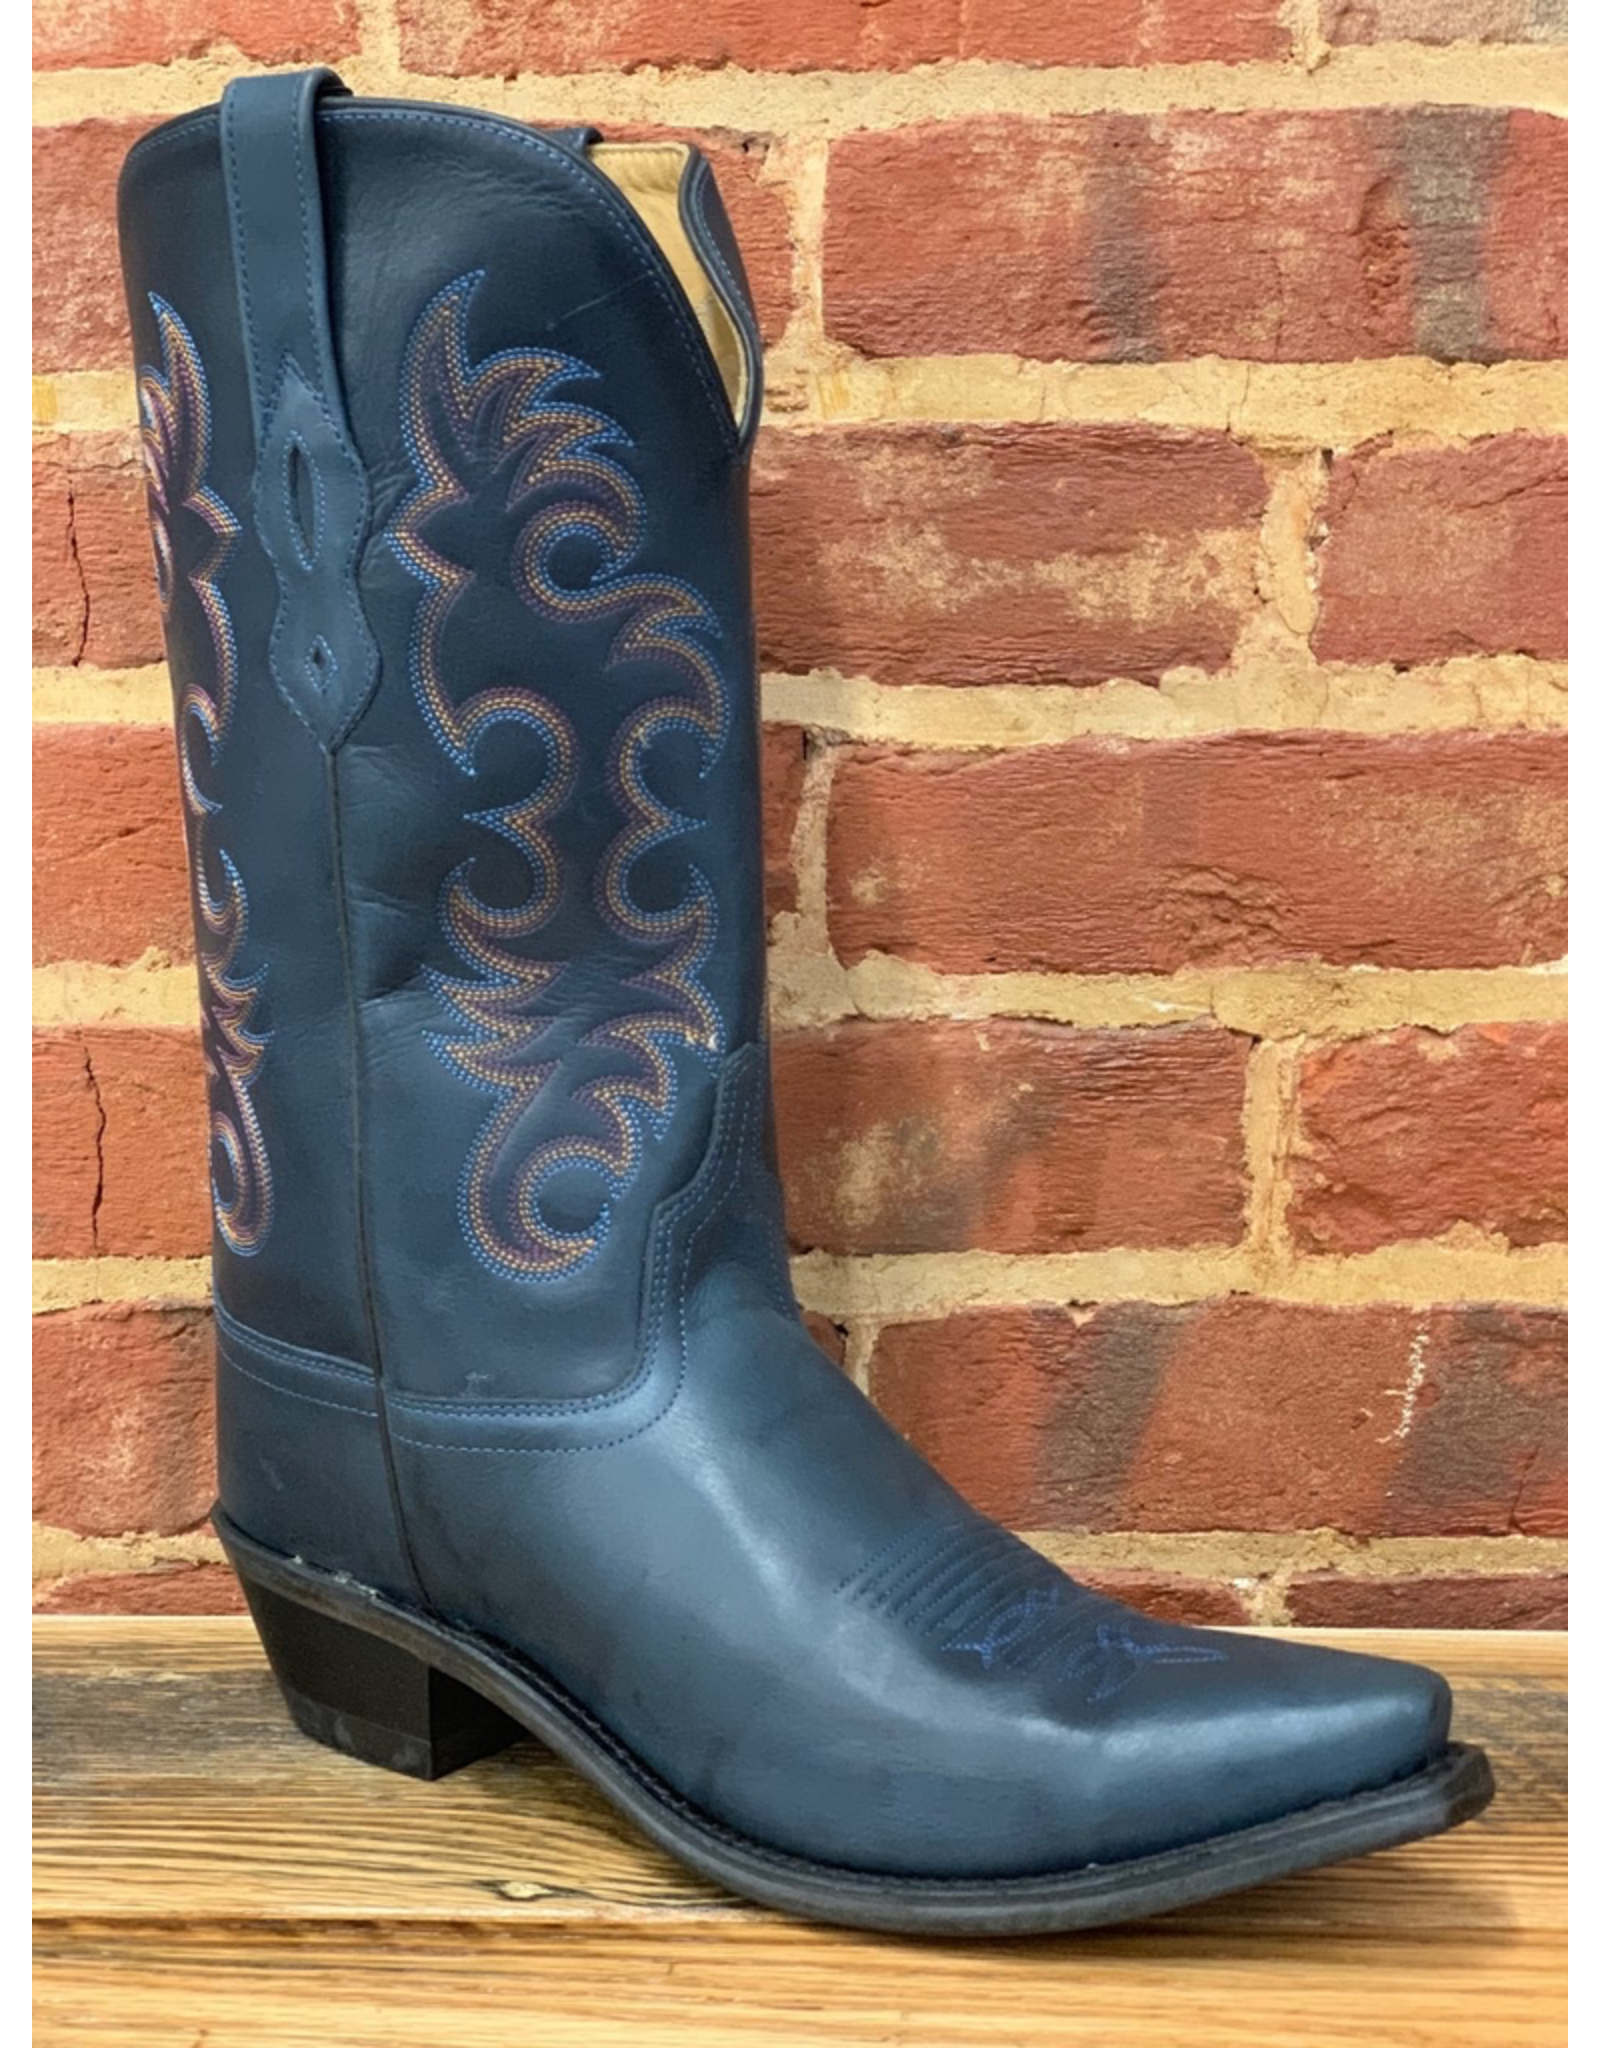 Boots-Women OLD WEST LF1513<br /> Navy Blue Calf